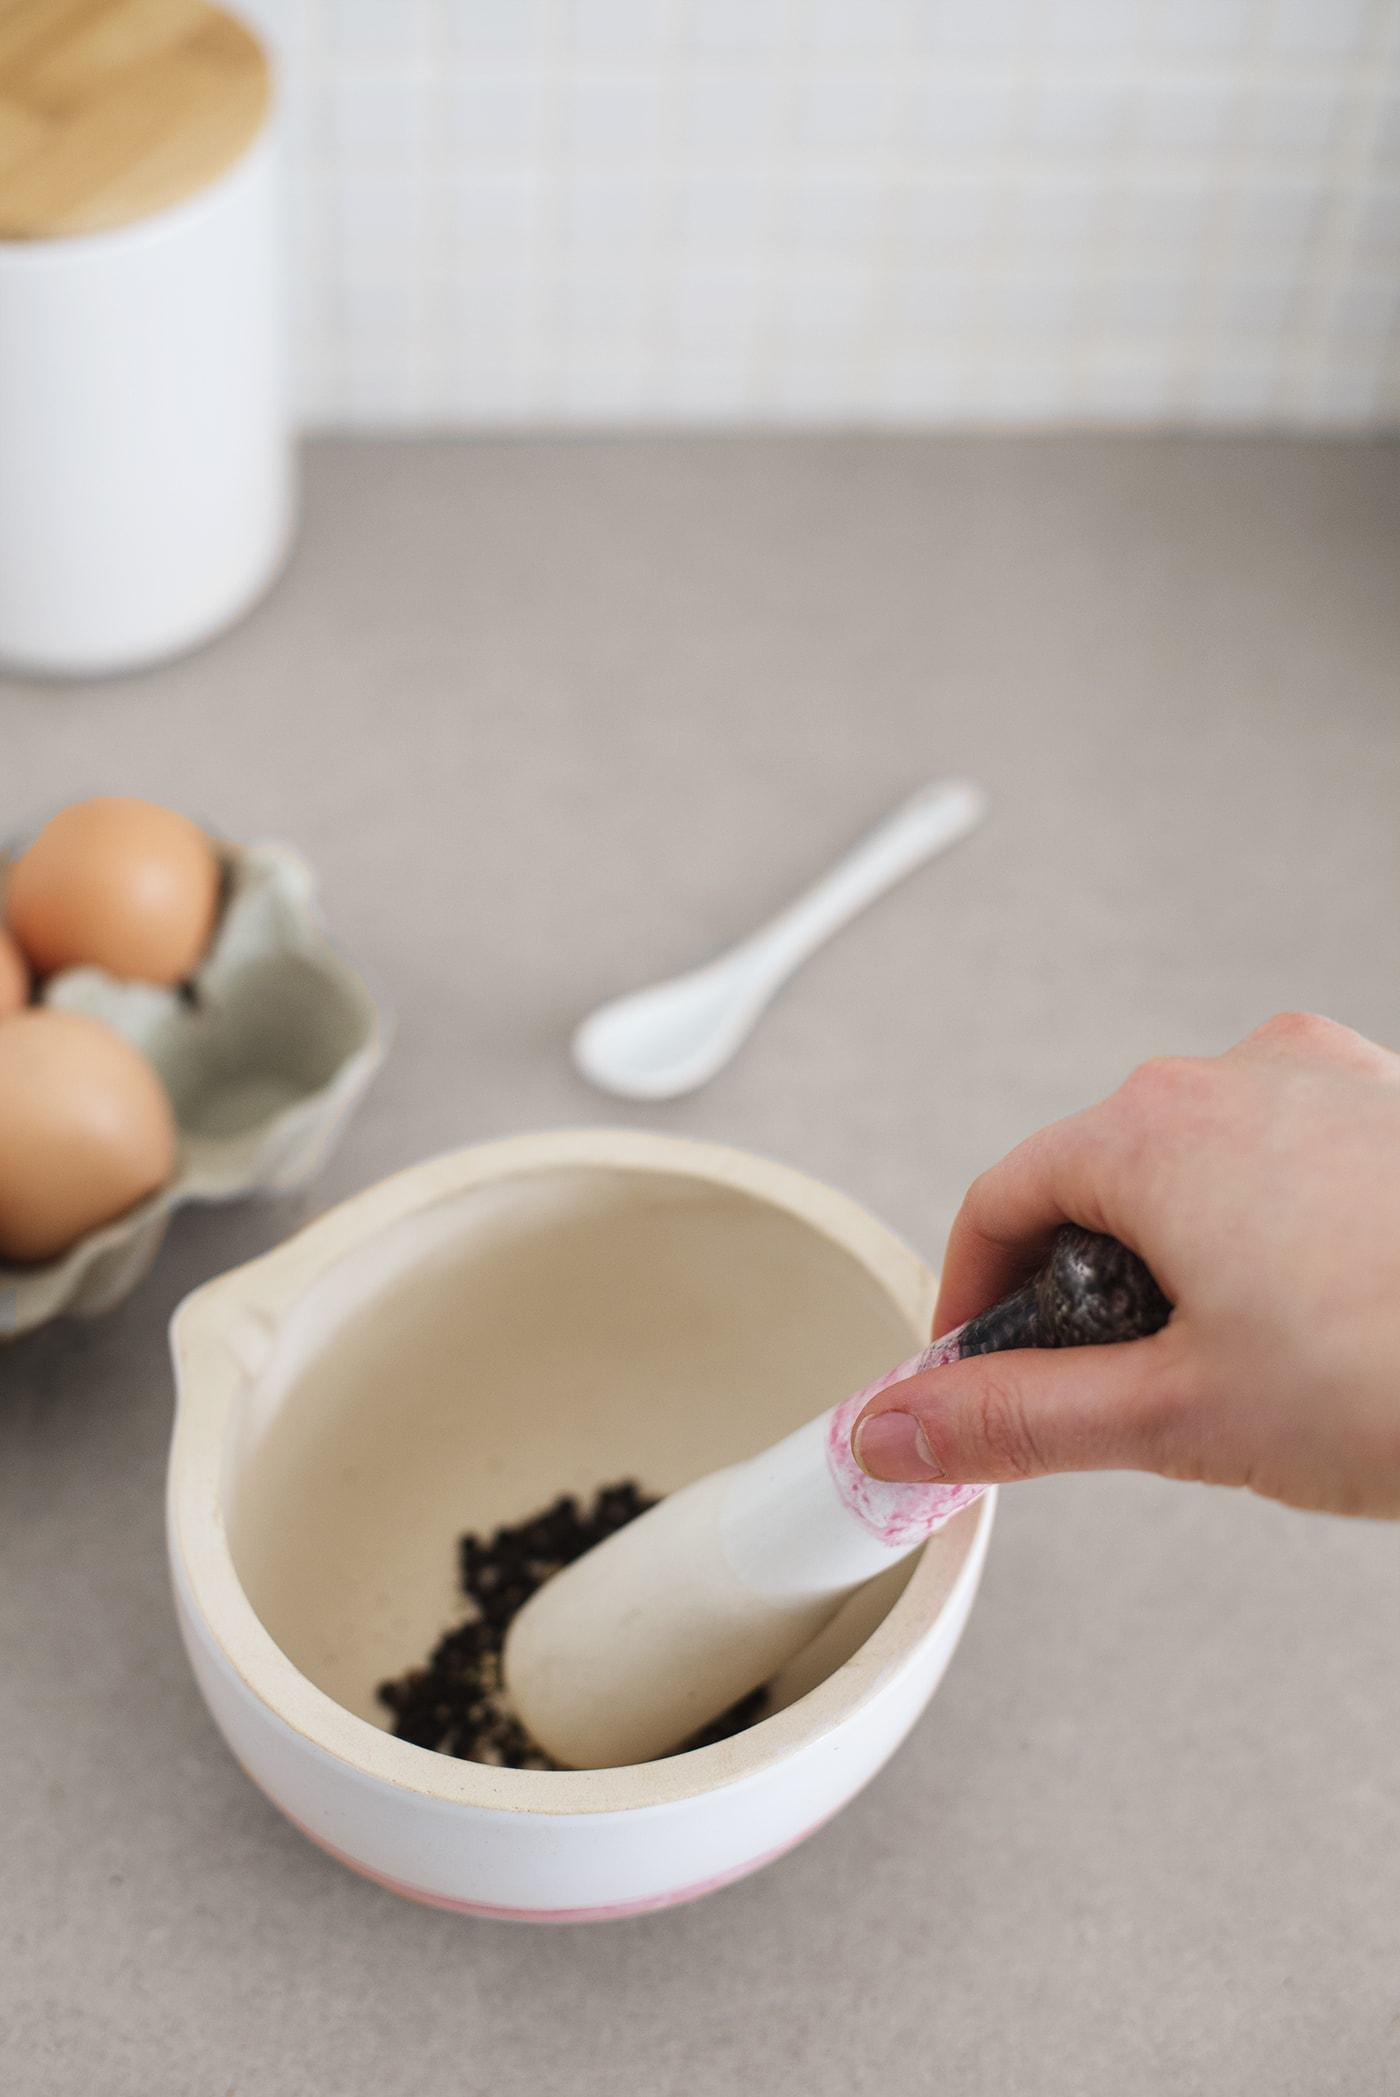 DIy dip dye effect pestal & mortar bowl | home crafts for the kitchen | porcelain paint